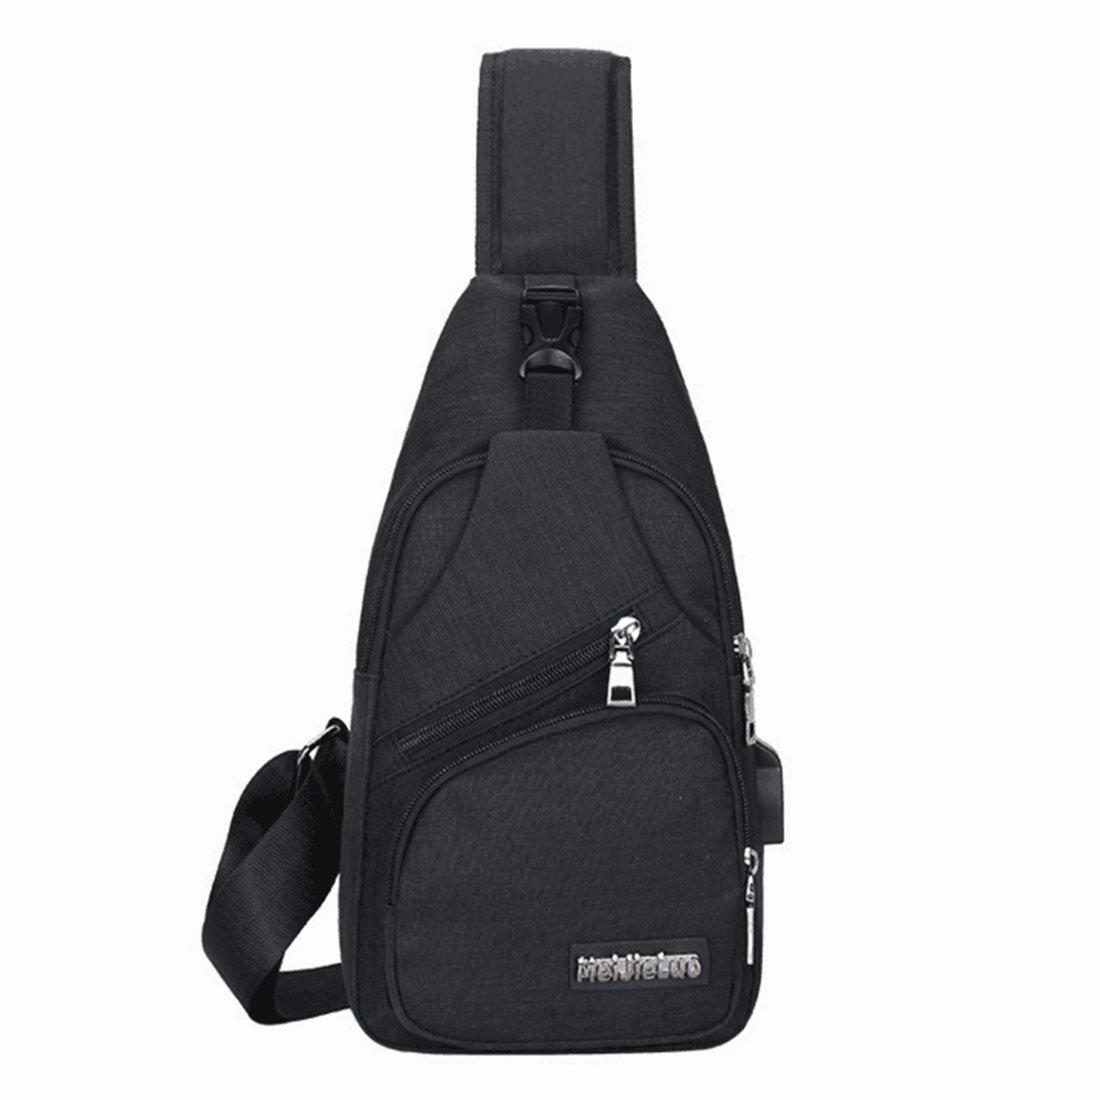 RABILTY Sling Bag Color : Light Grey Chest Pack Crossbody Lightweight with USB Charging Port Shoulder Bag for Men Women Travel Outdoors Boys Girls